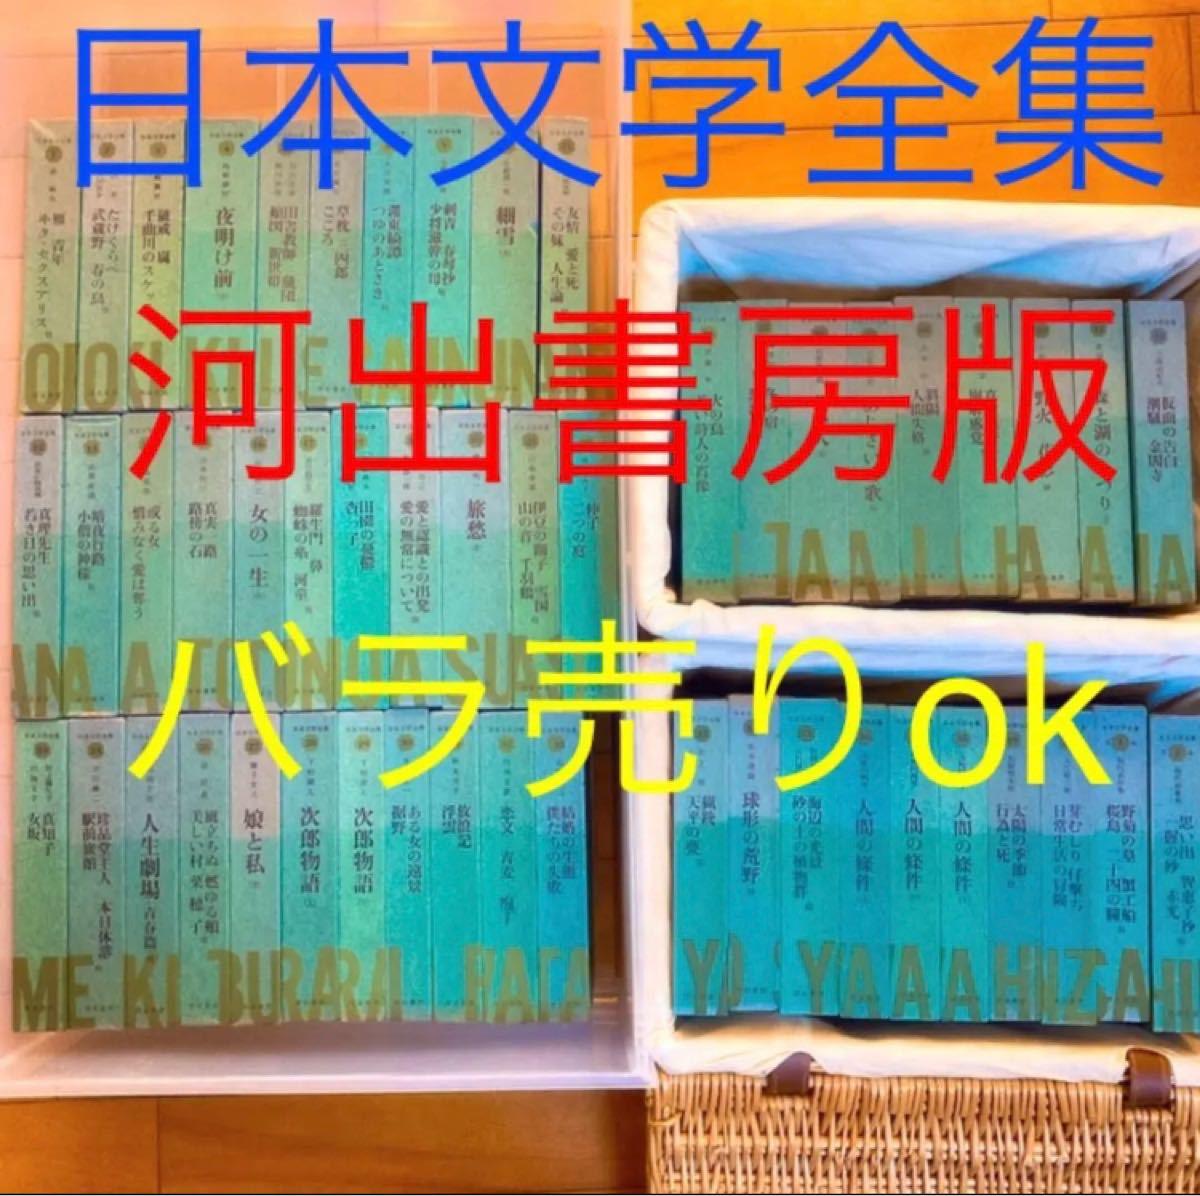 日本文学全集 河出書房版 バラ売りok